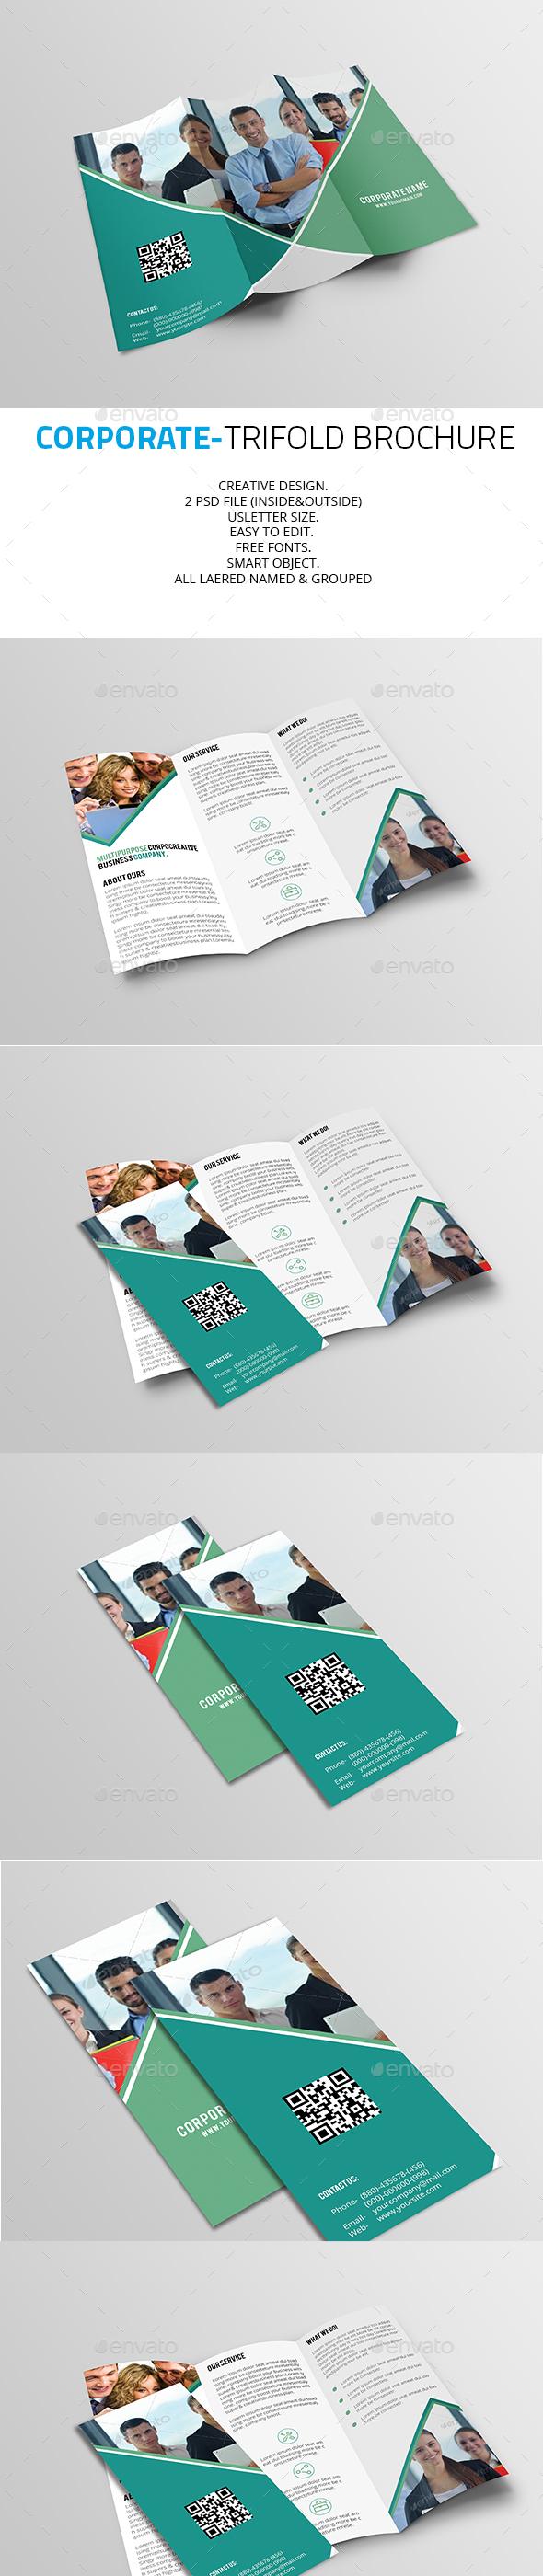 Colors Corporate Trifold Brochure - Corporate Brochures